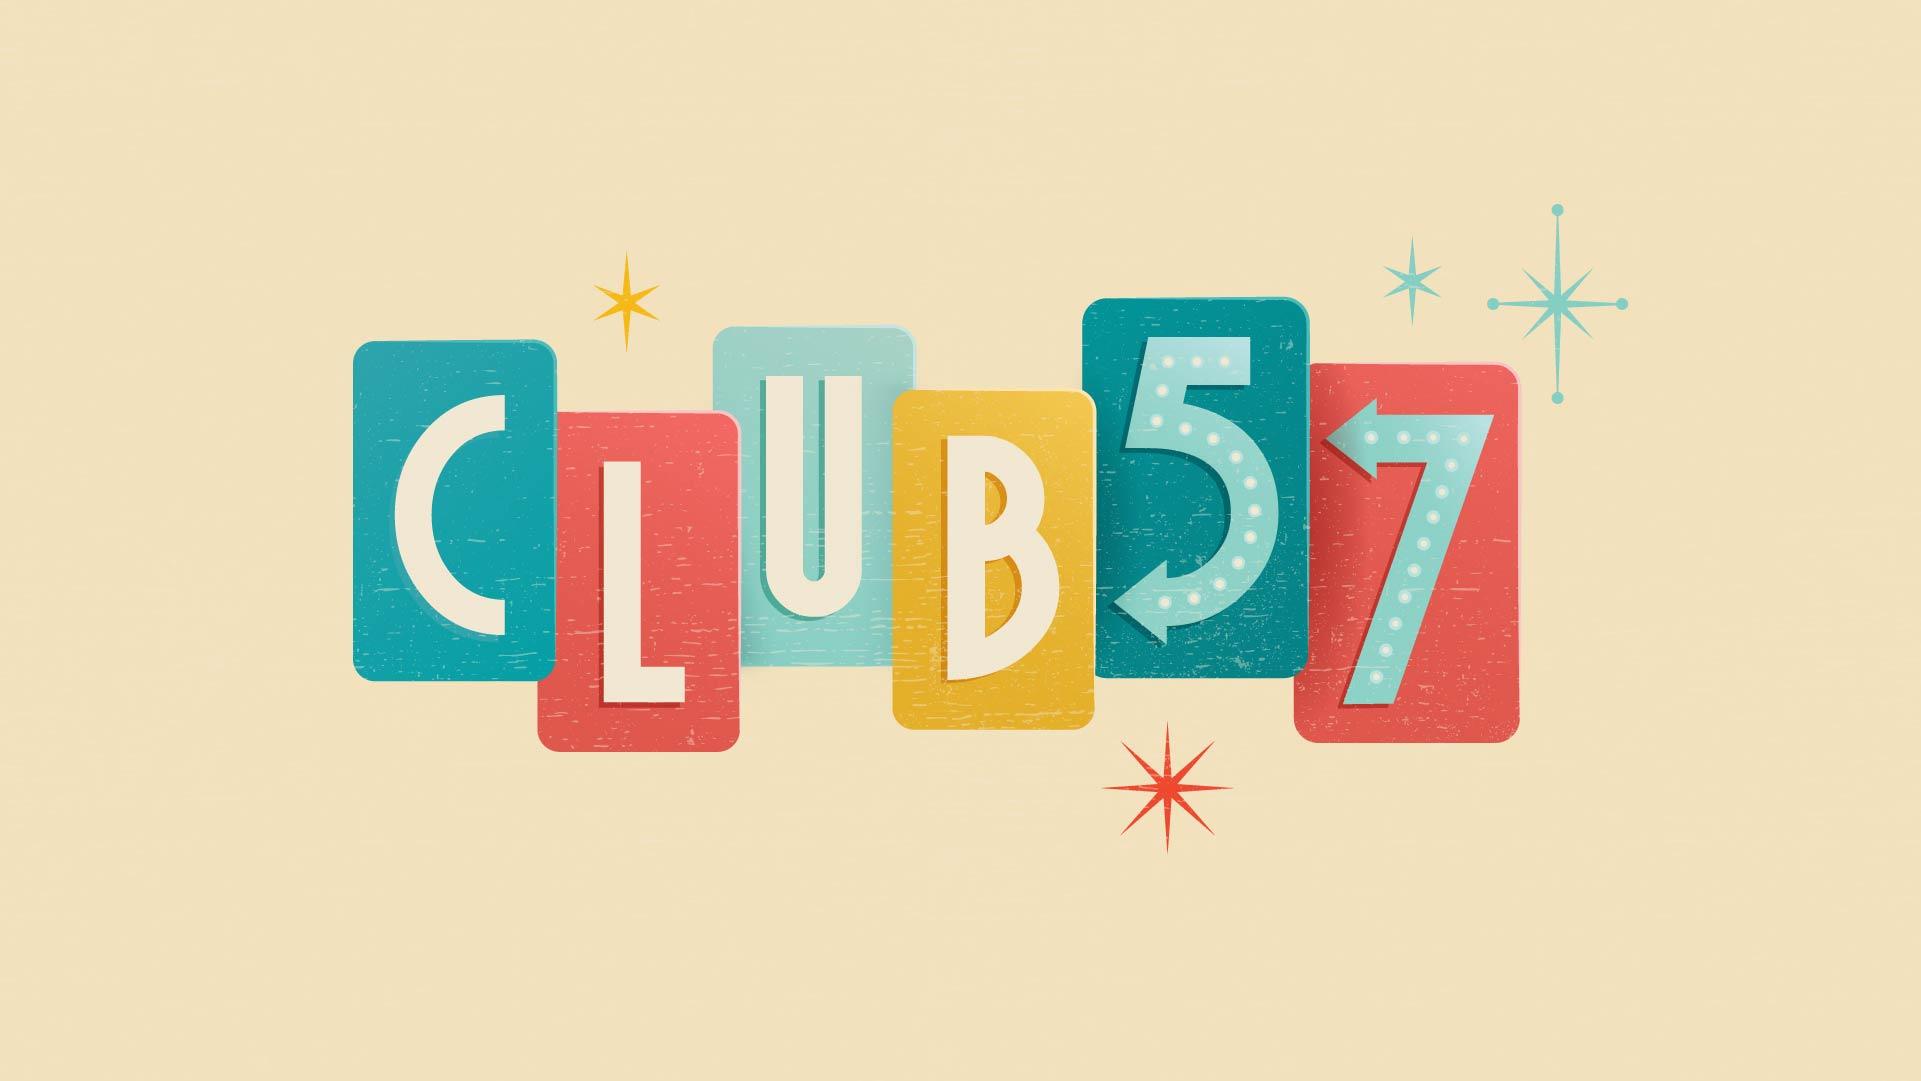 tira_club_2019-02